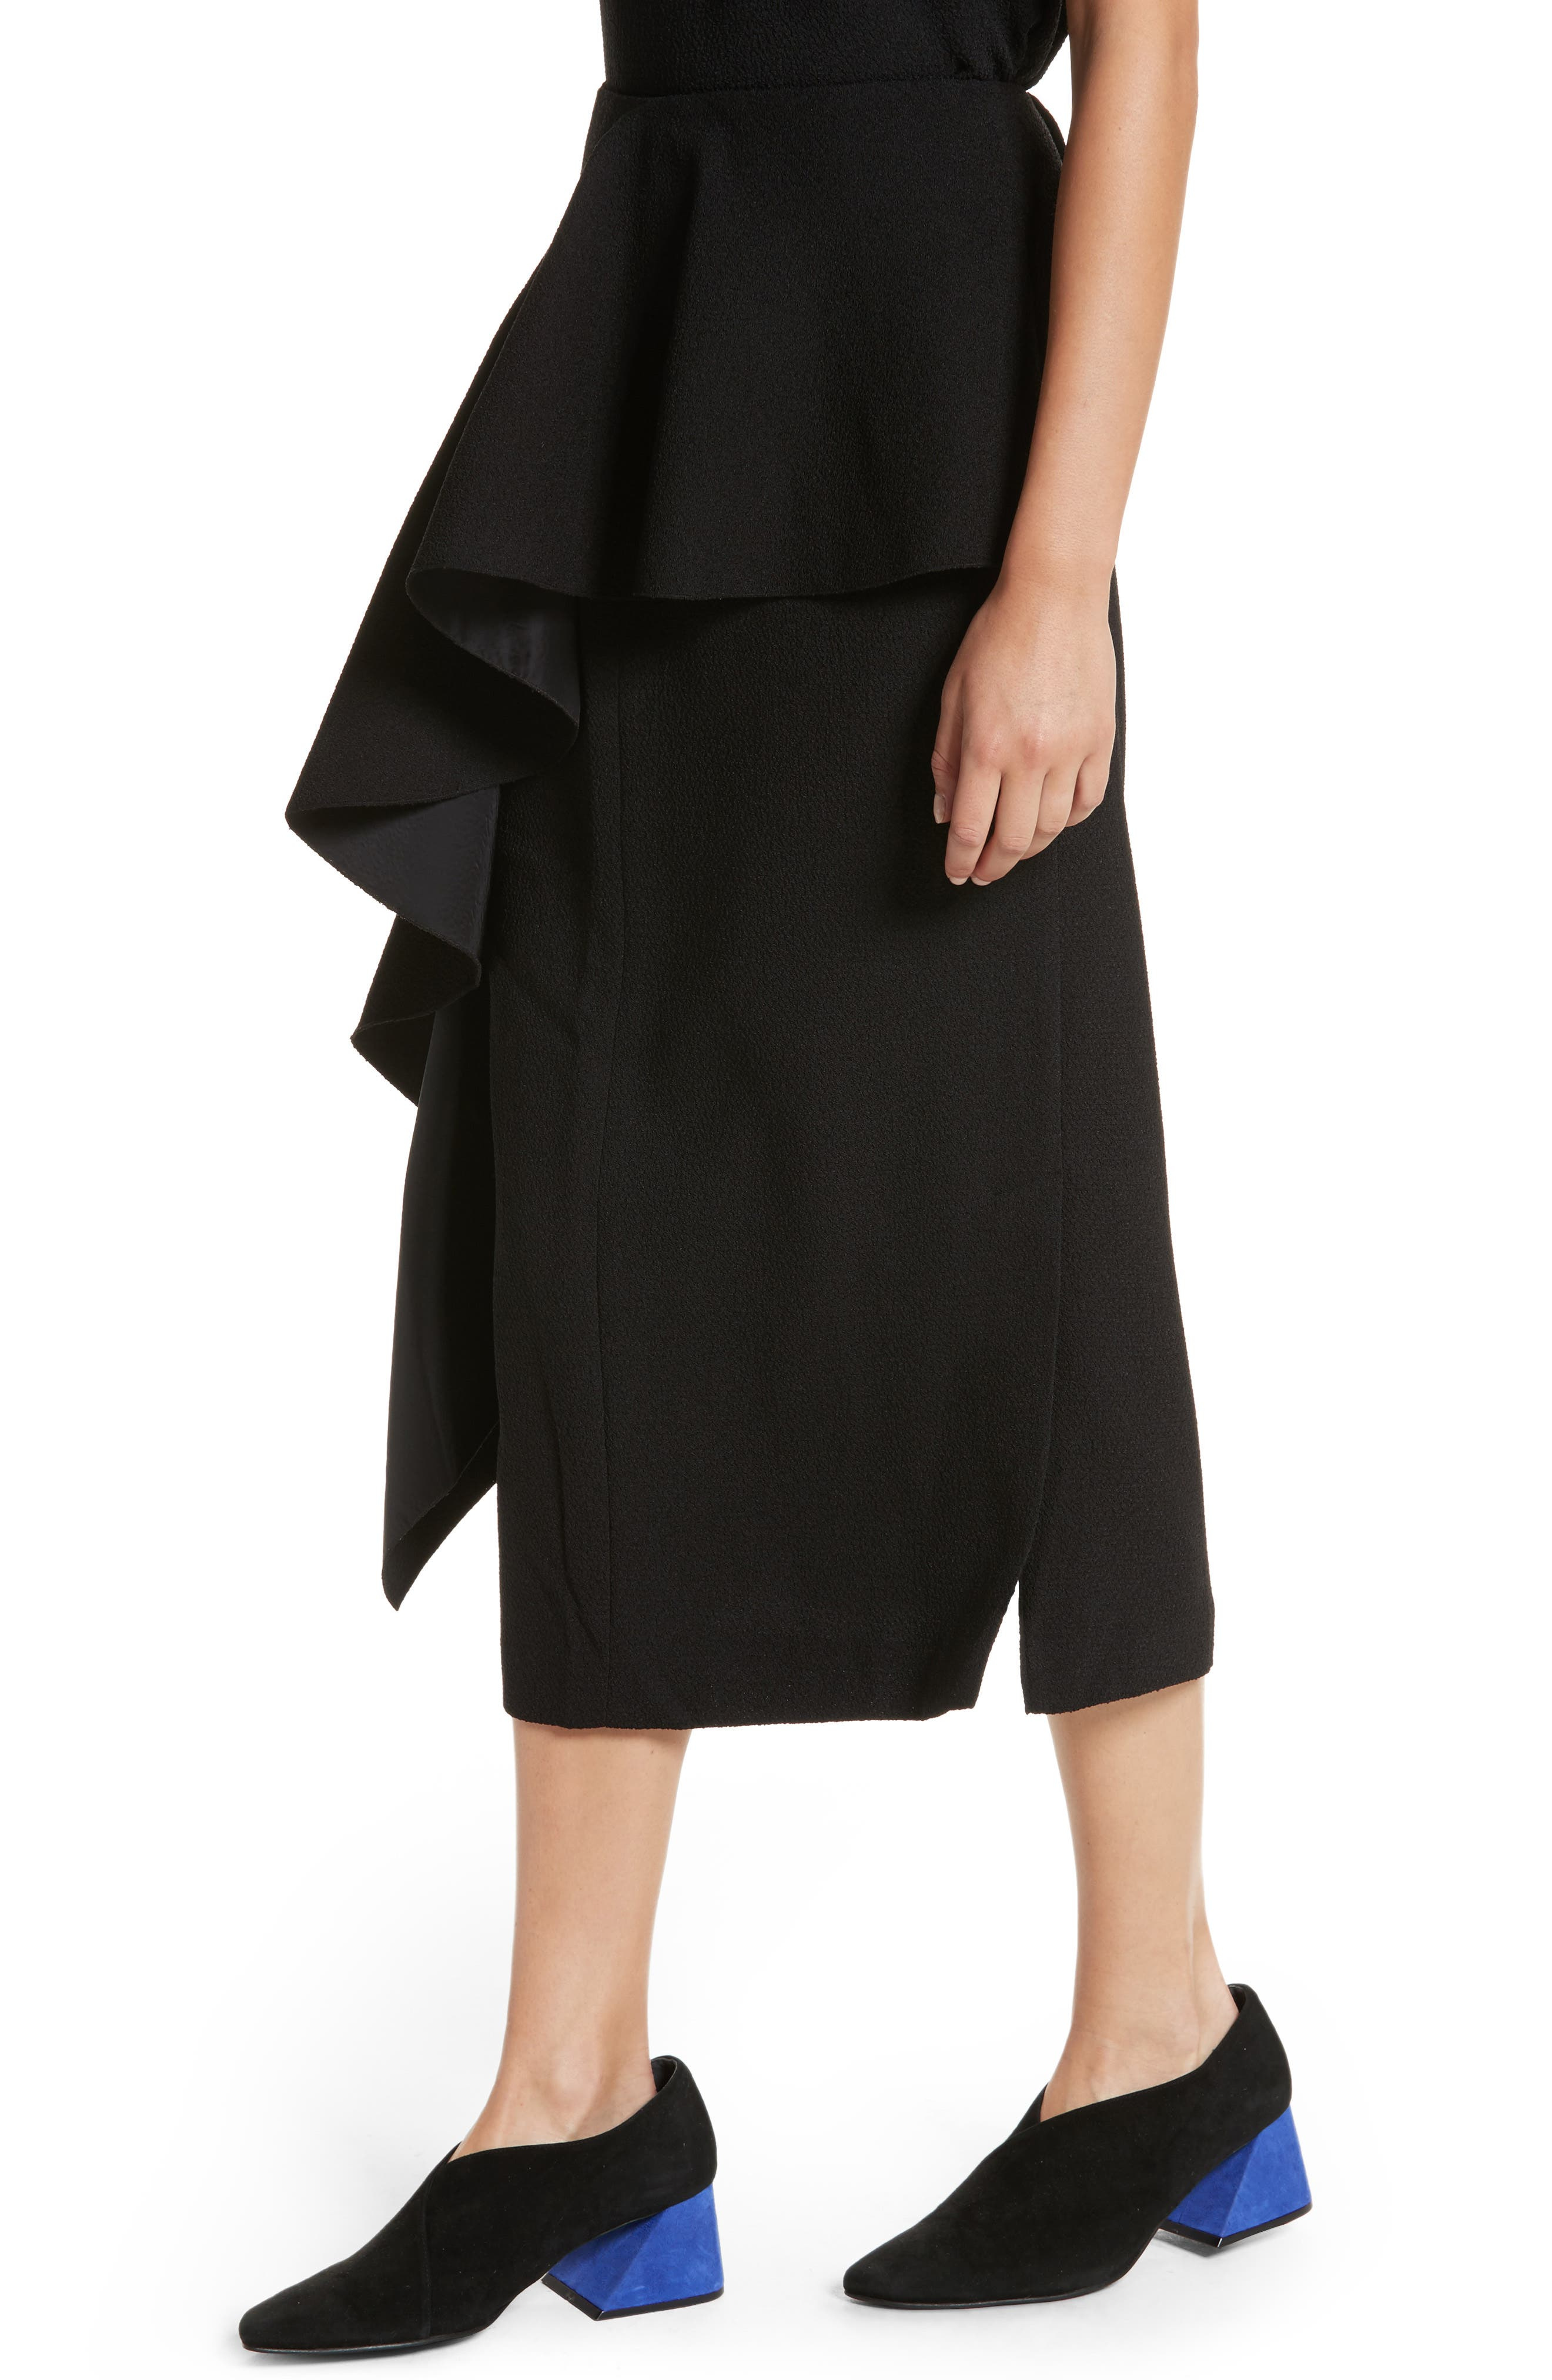 Alternate Image 4  - Rejina Pyo Maude Ruffle Panel Crepe Skirt (Nordstrom Exclusive)